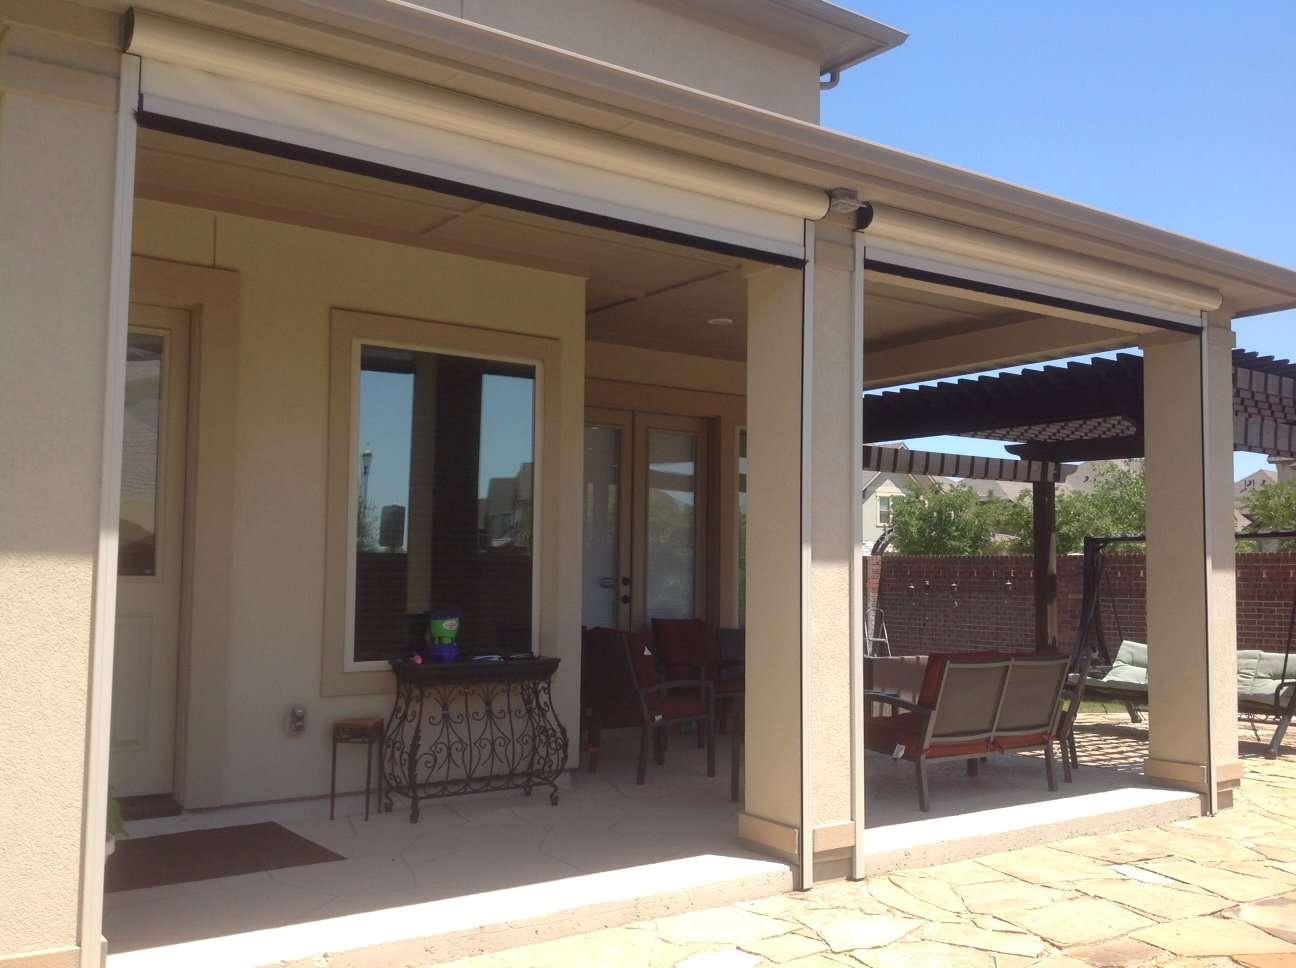 Houston, TX Motorized Retractable Screens, Solar Screens